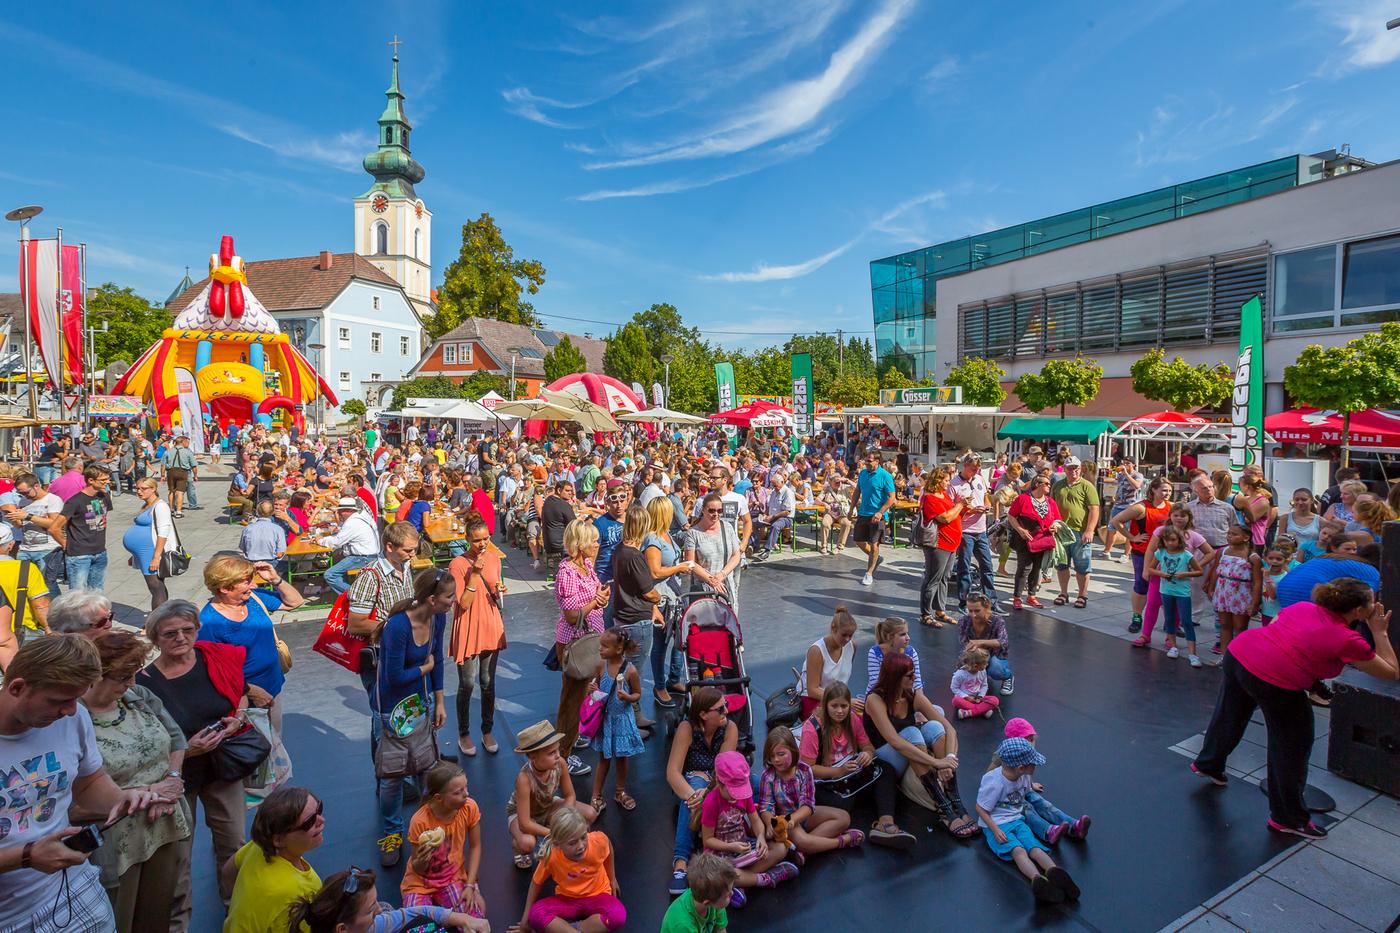 Menschmenge am Stadtplatz Leonding beim Stadtfest